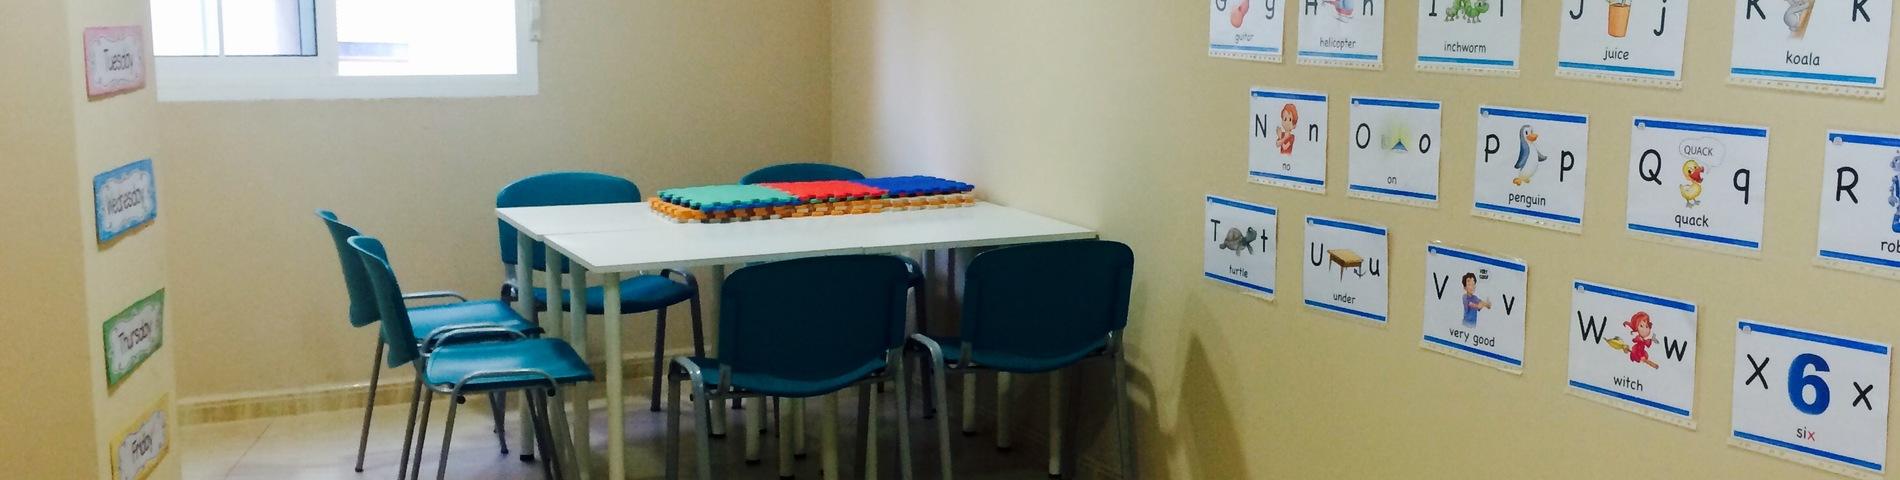 Orihuela Language Centre bild 1